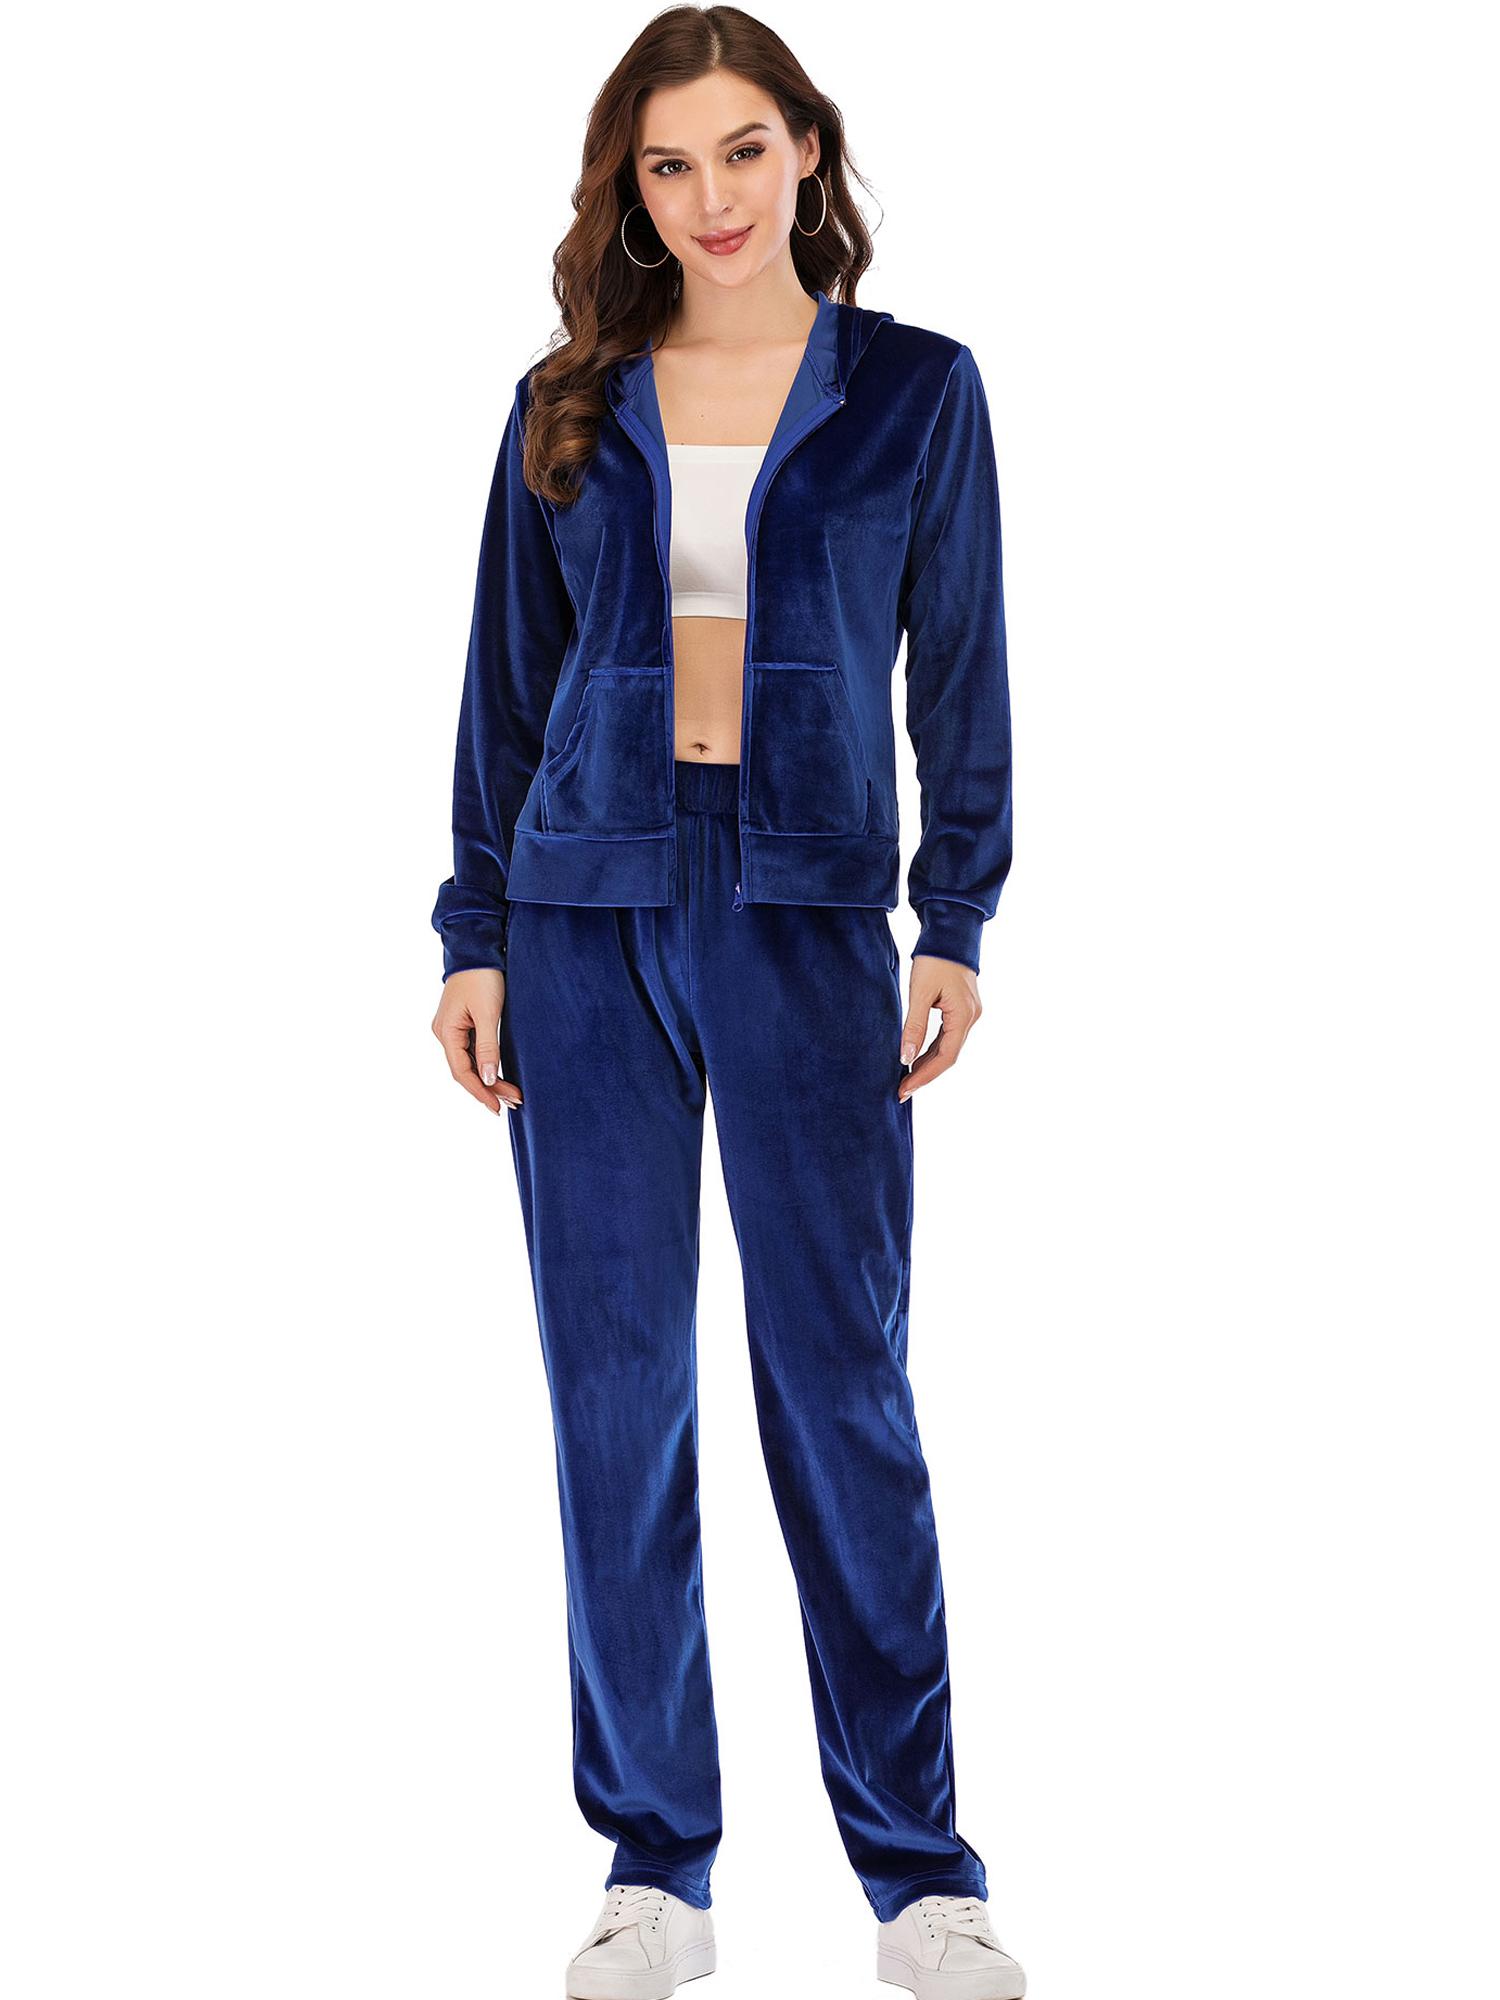 Womens Velvet Sweatsuit Set 2 Piece Pullover and Drawstring Sweatpants Sport Outfits Sleepwear Pajama Set